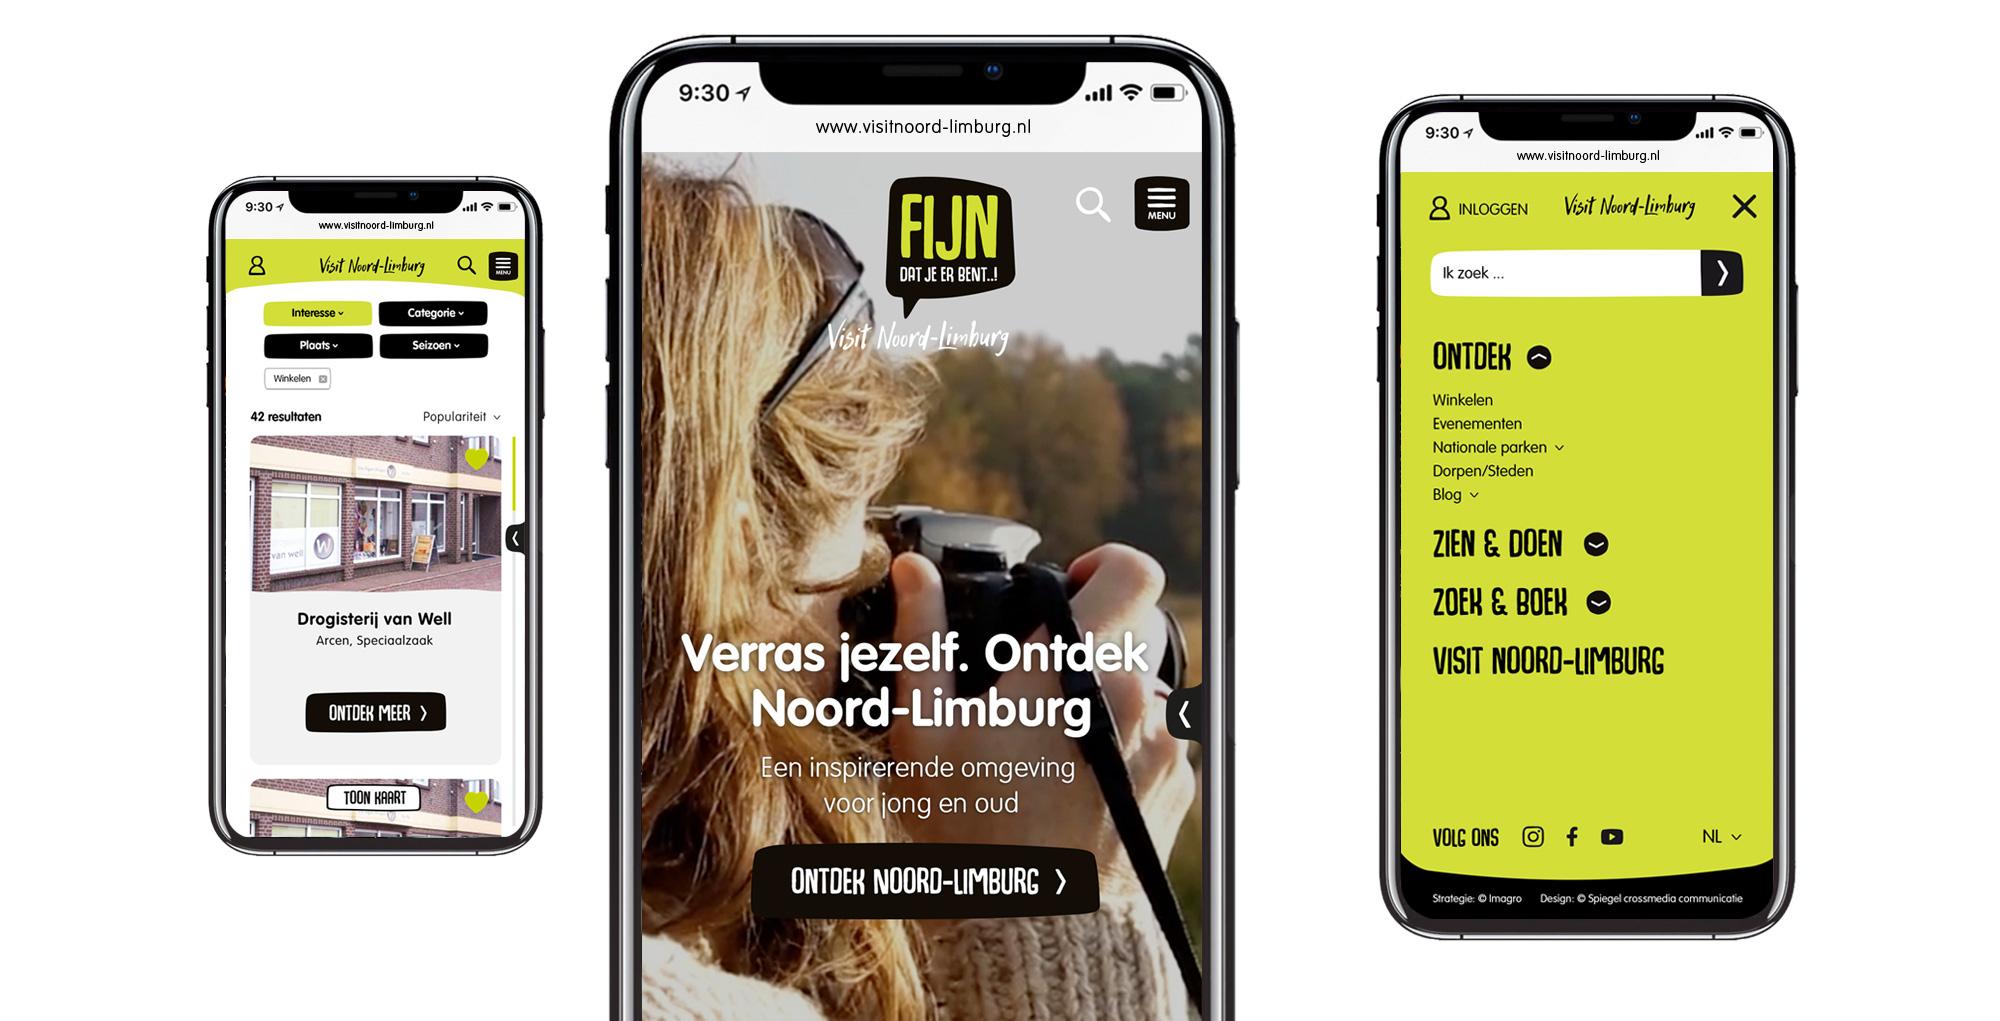 Visit Noord-Limburg - Spiegel crossmedia communicatie